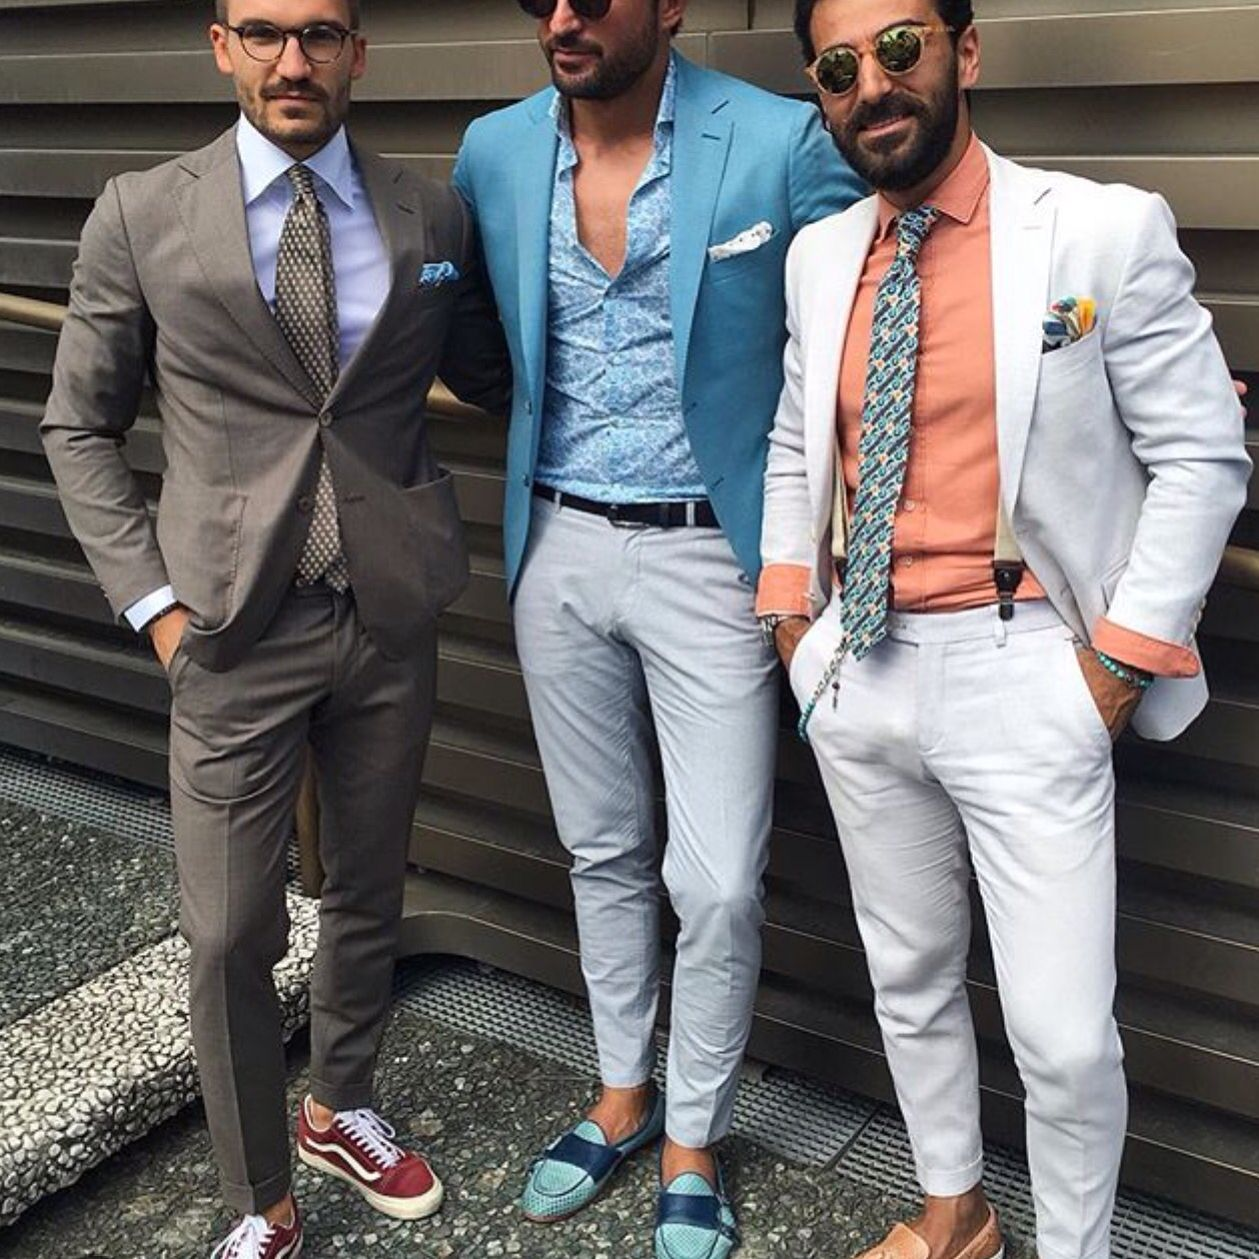 Pin by Raymond Stovall on Men\'s Style   Pinterest   Man style, Men\'s ...